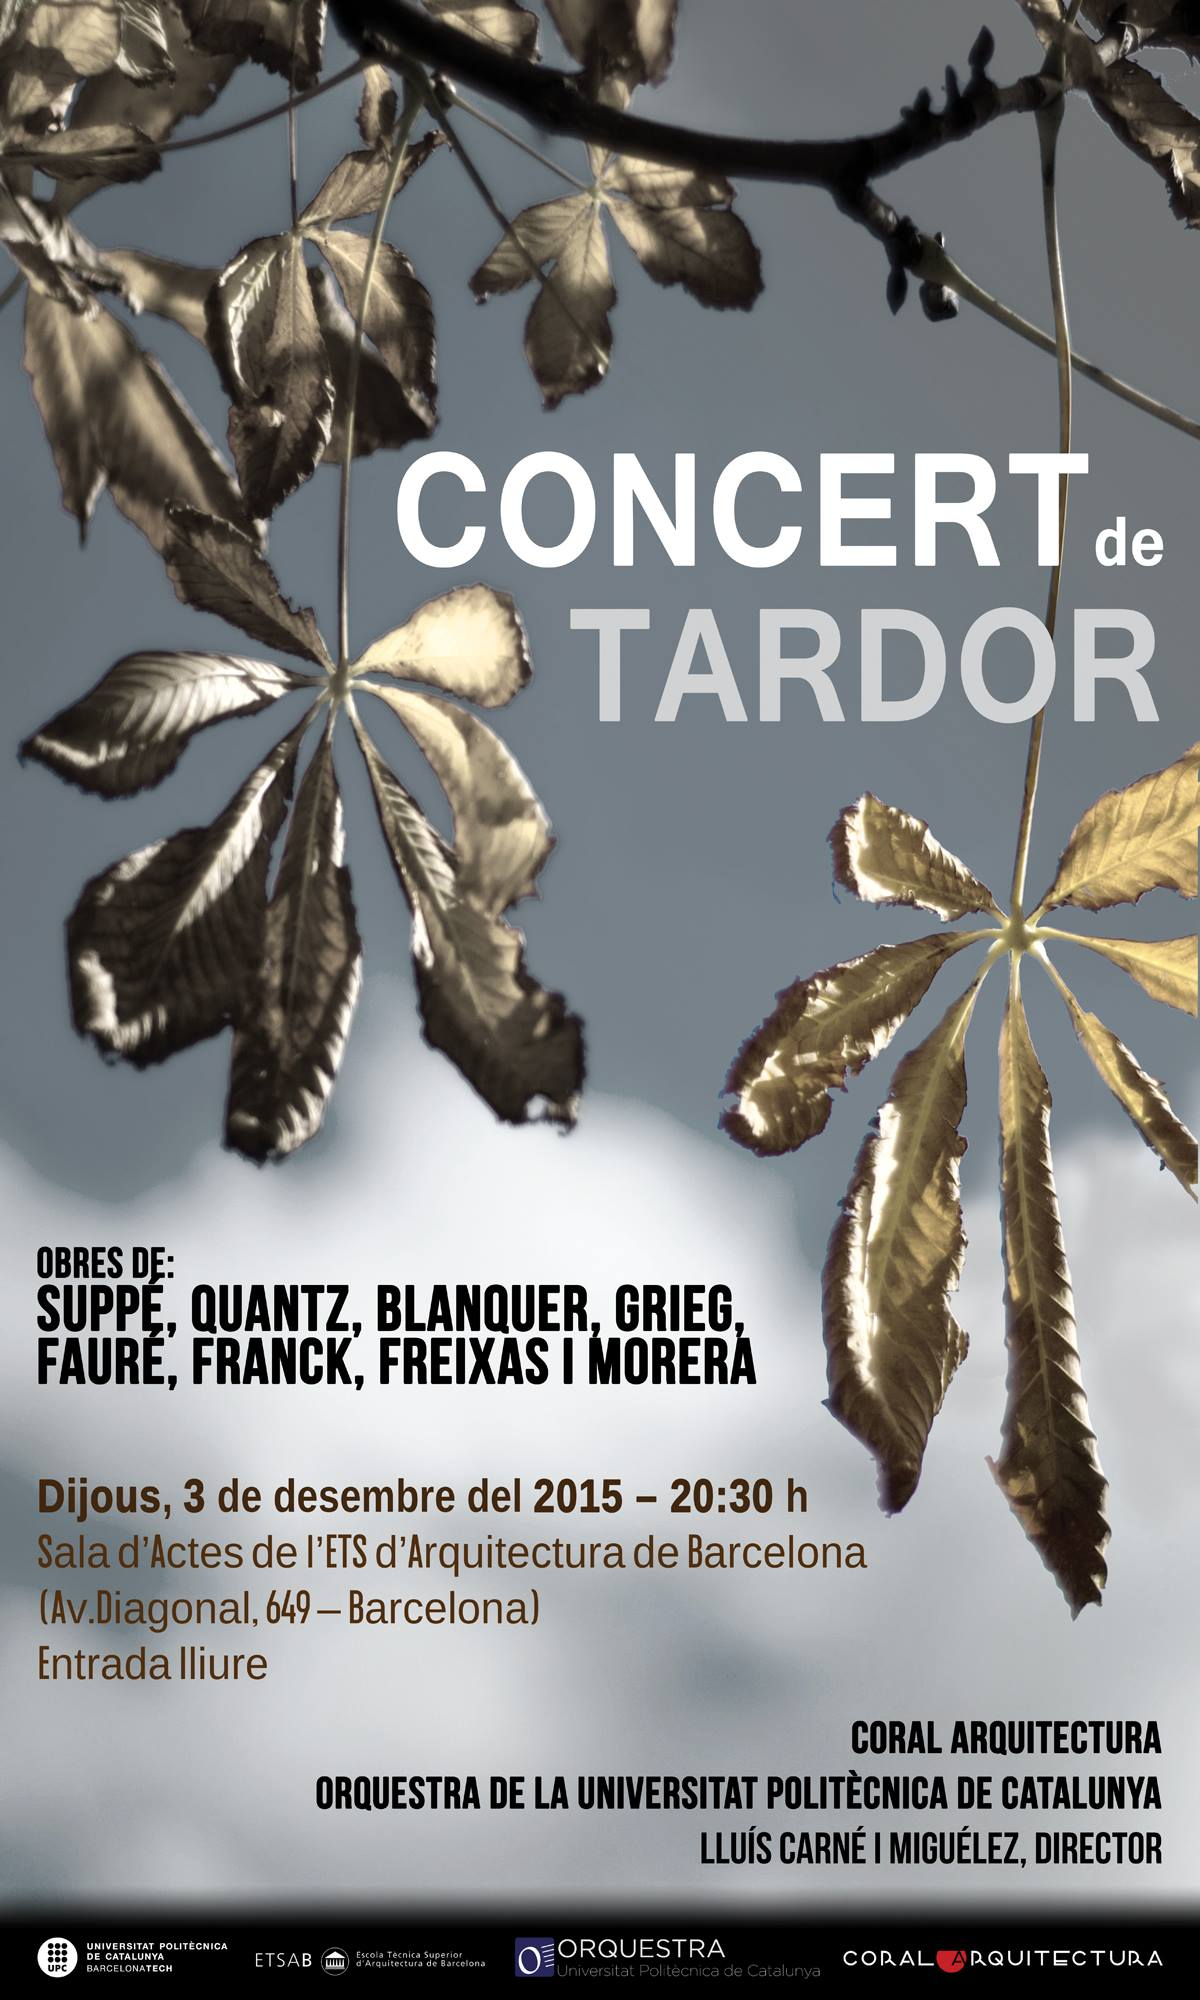 Primer concert de tardor 2015